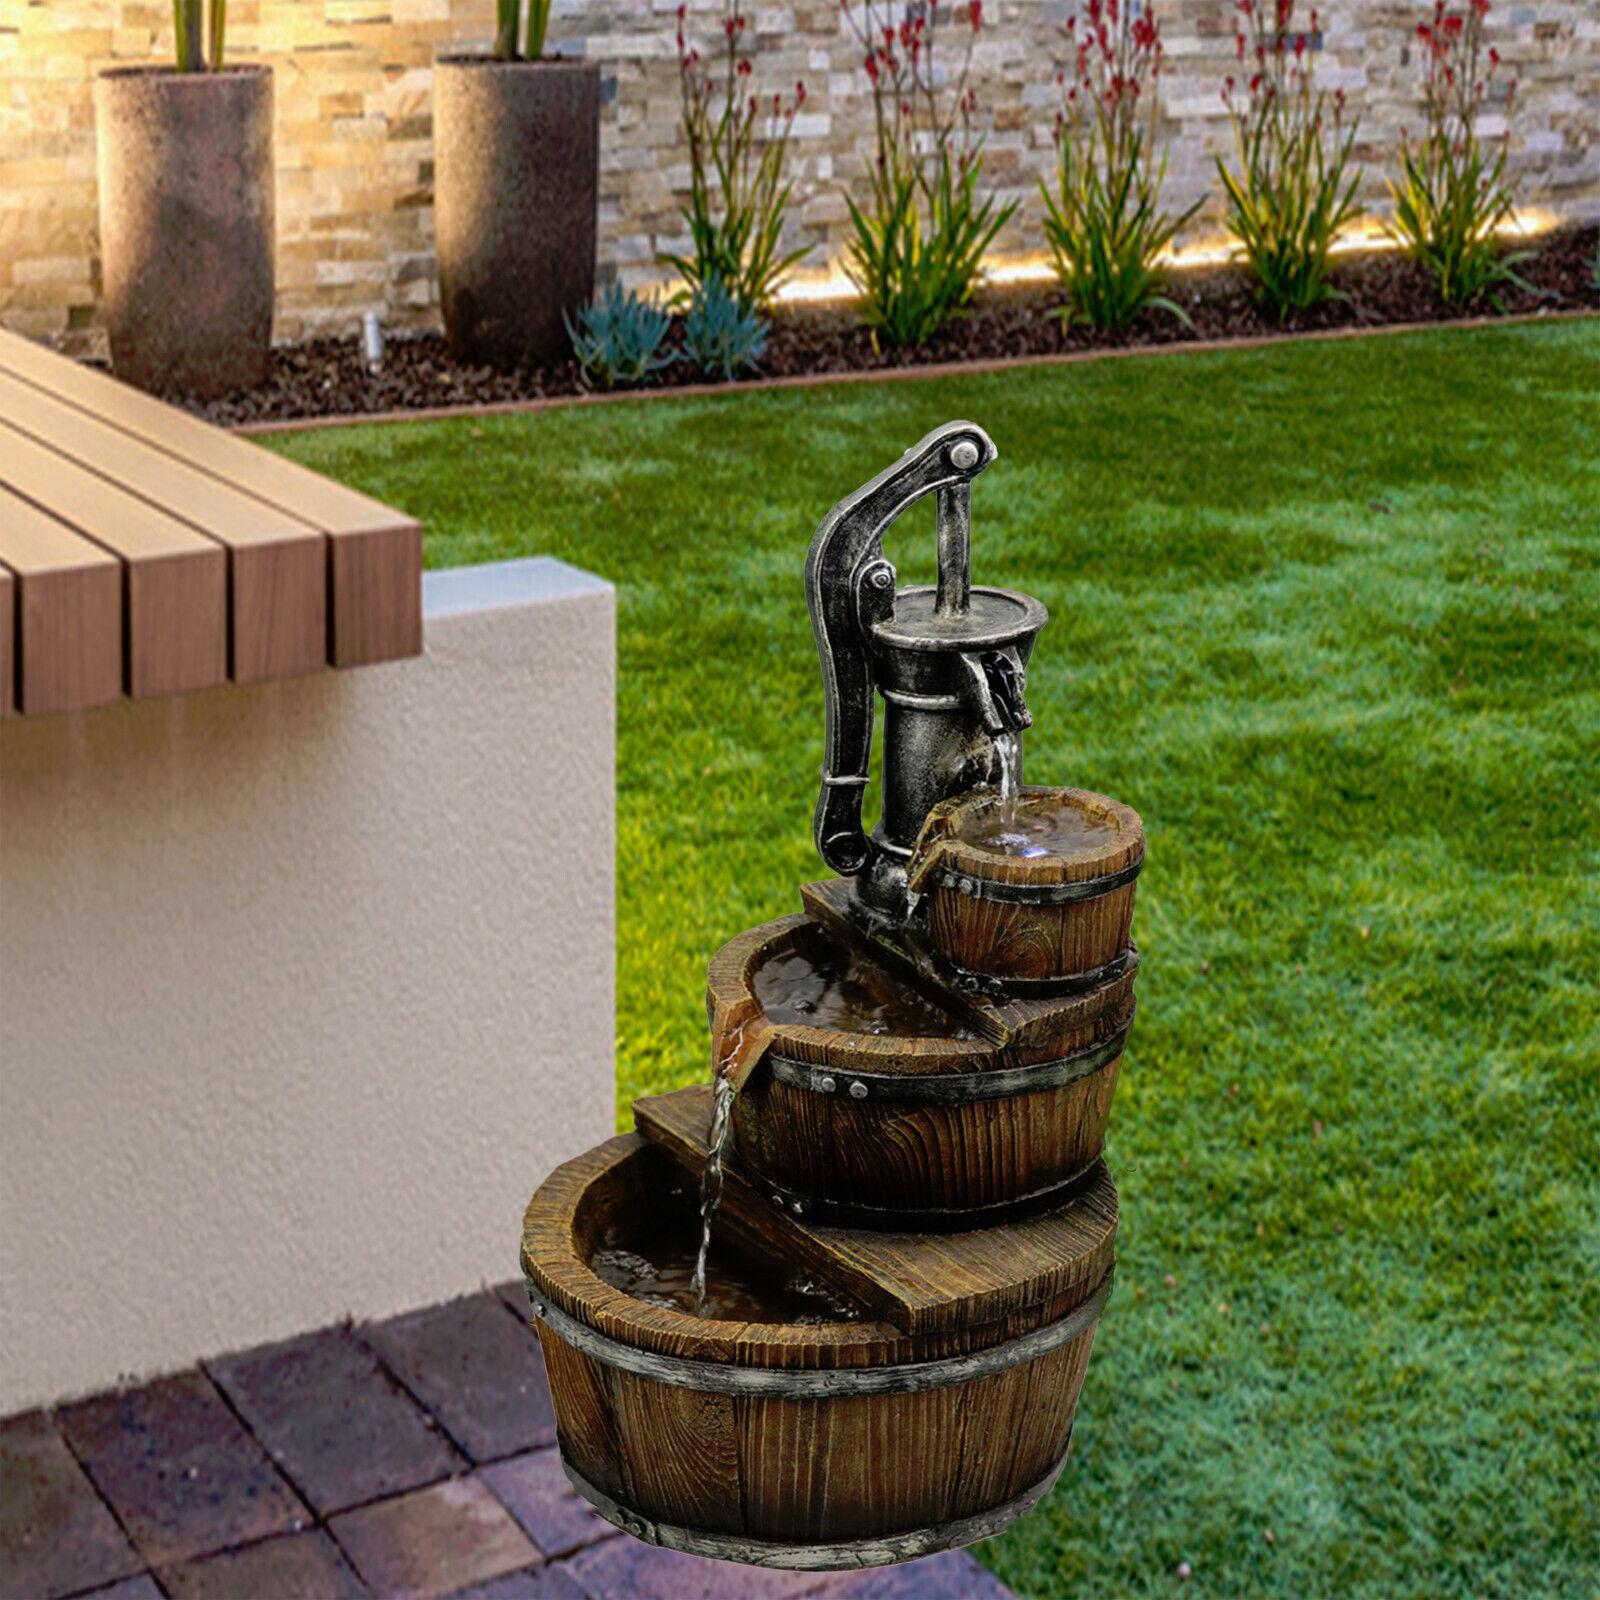 Fuente De Agua Bomba de Poliresina de interior al aire libre cuentan con Luces LED Jardín Estatua